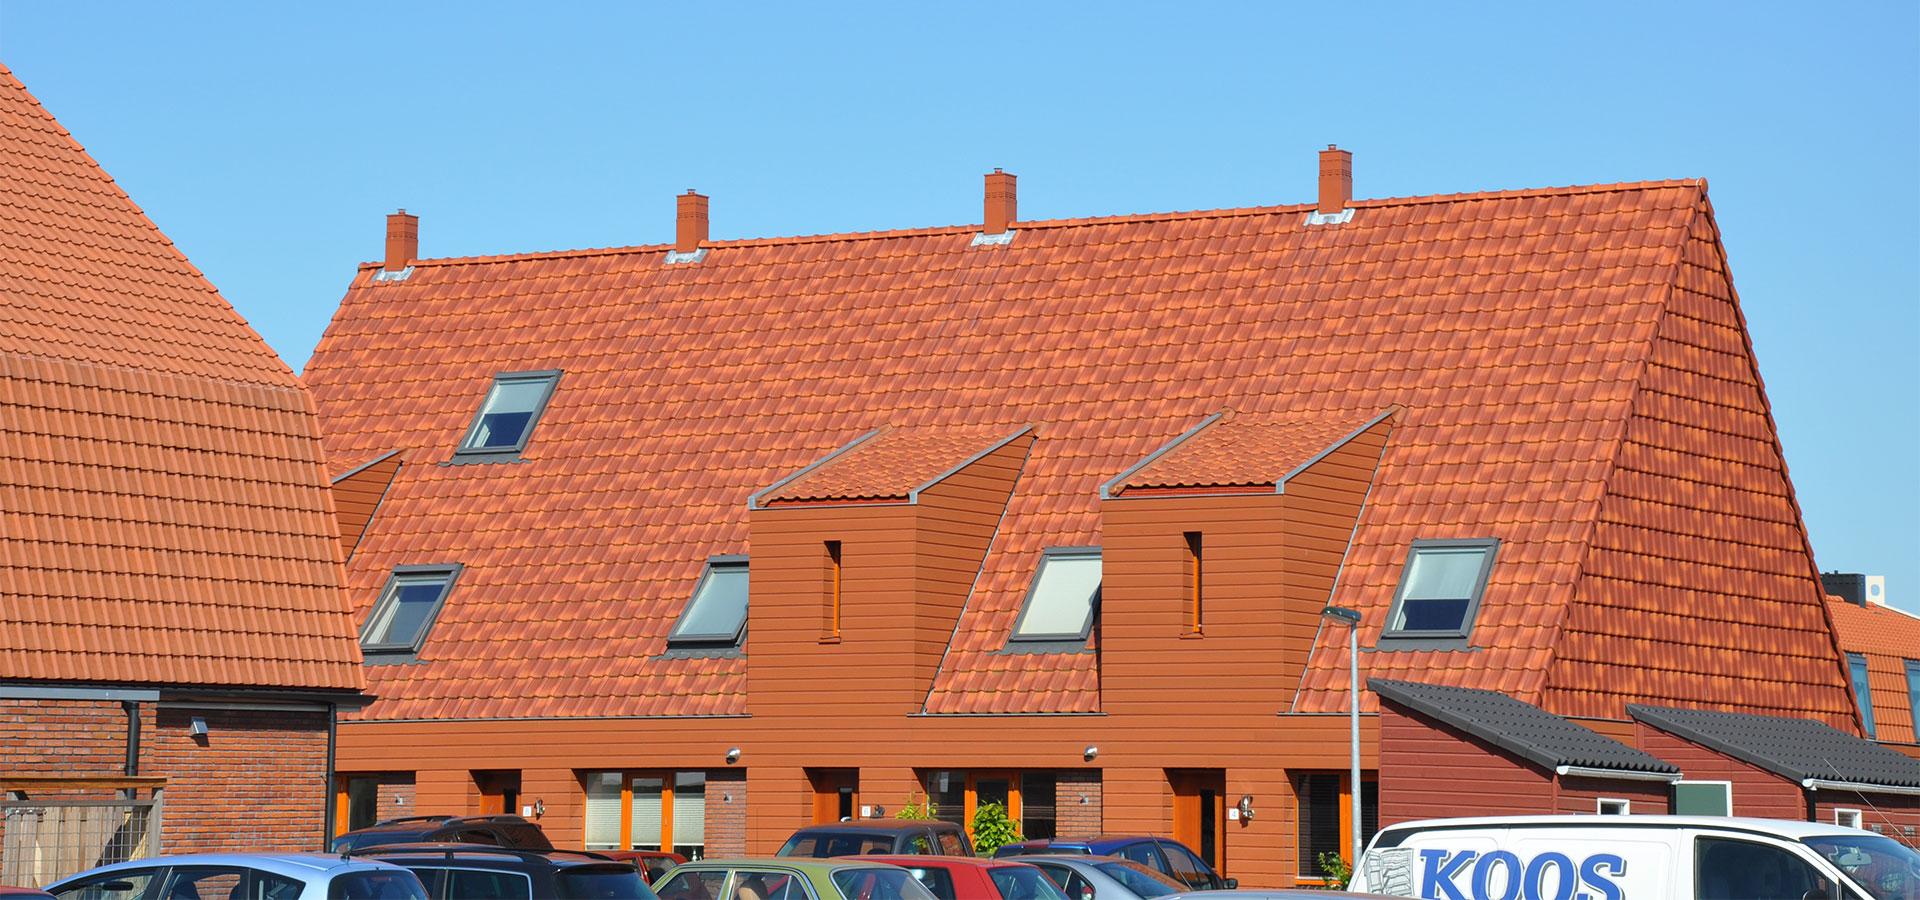 FARO architecten Twuyverhoek Sint Pancras 12